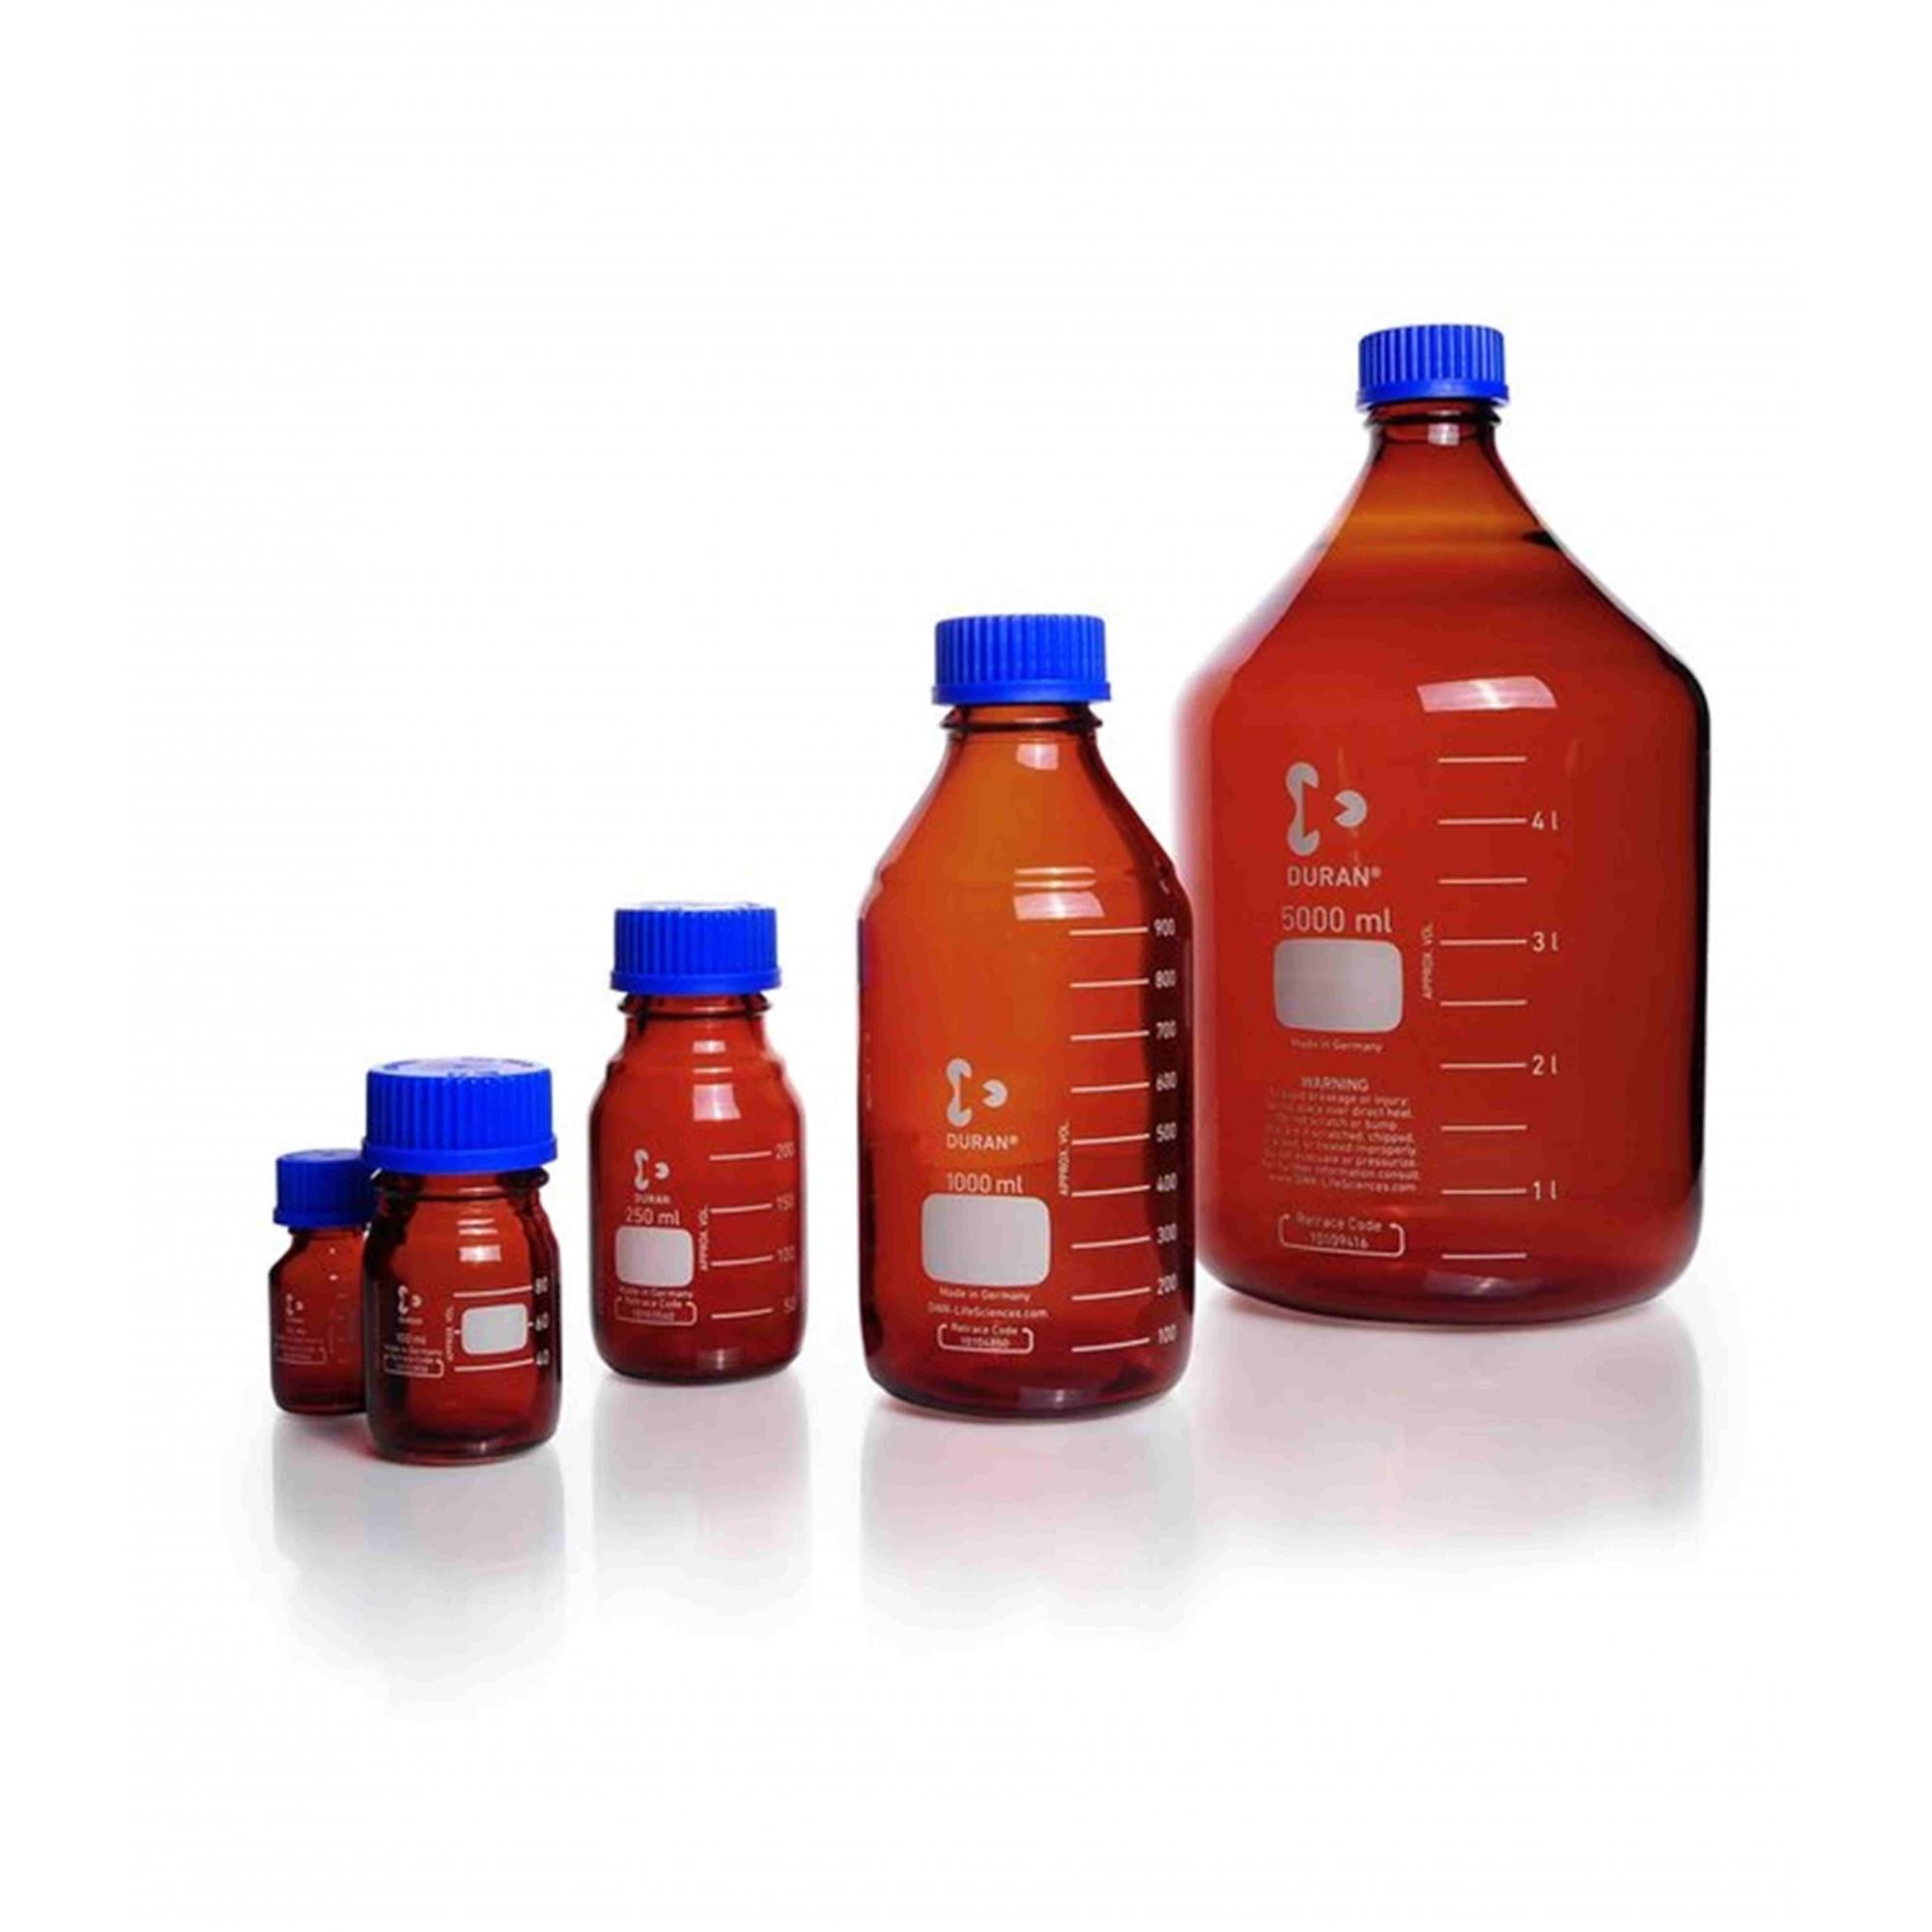 Frasco Reagente Âmbar Tampa Azul 3500 ml - Schott - Cód. 21806695